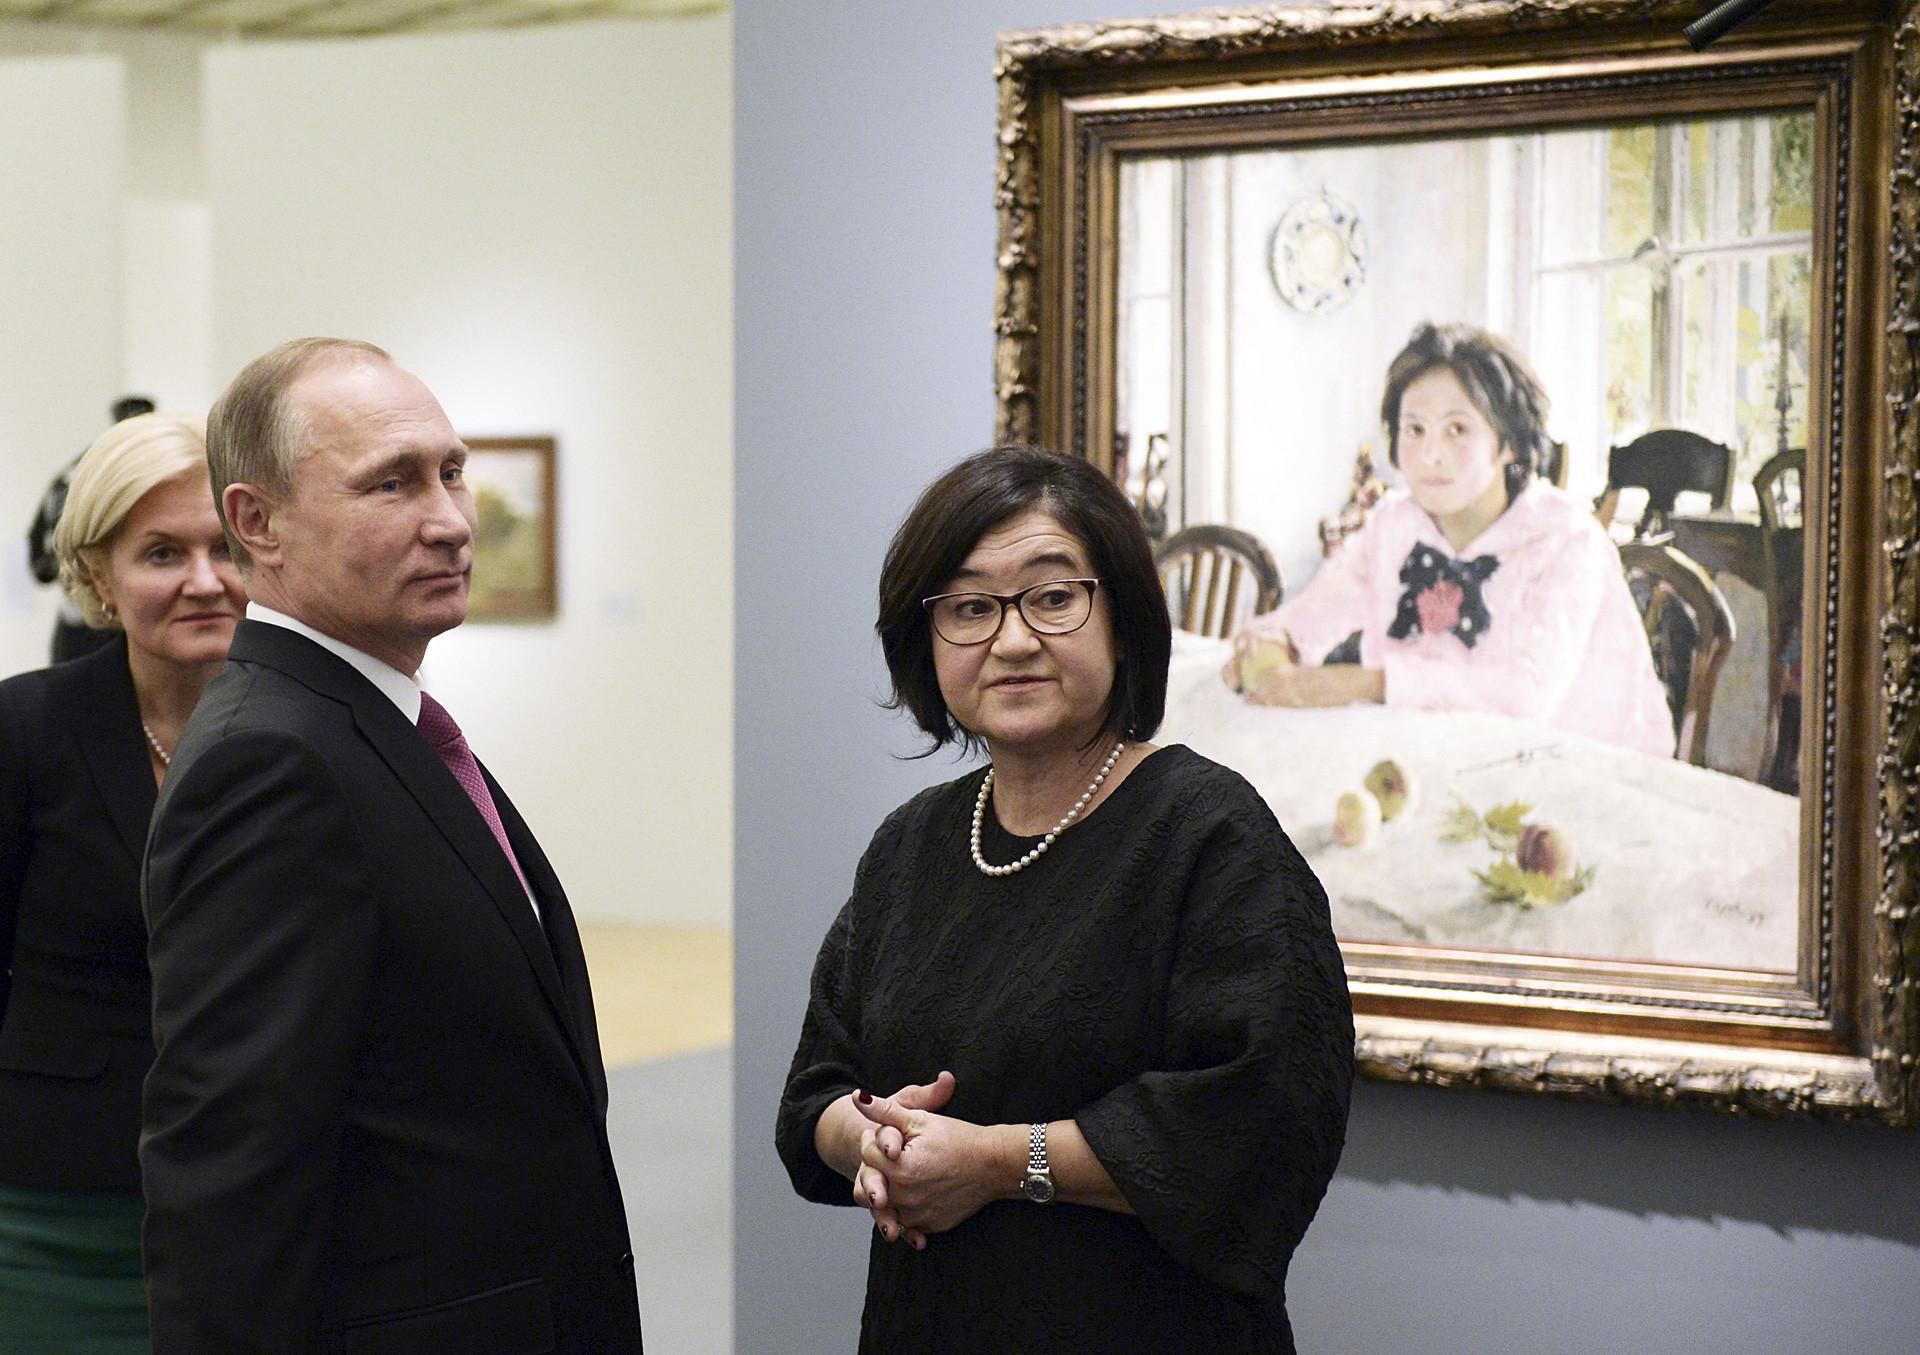 Wladimir Putin und Selfira Tregulowa, Direktorin der Tretjakow-Galerie, 18. Januar, 2016